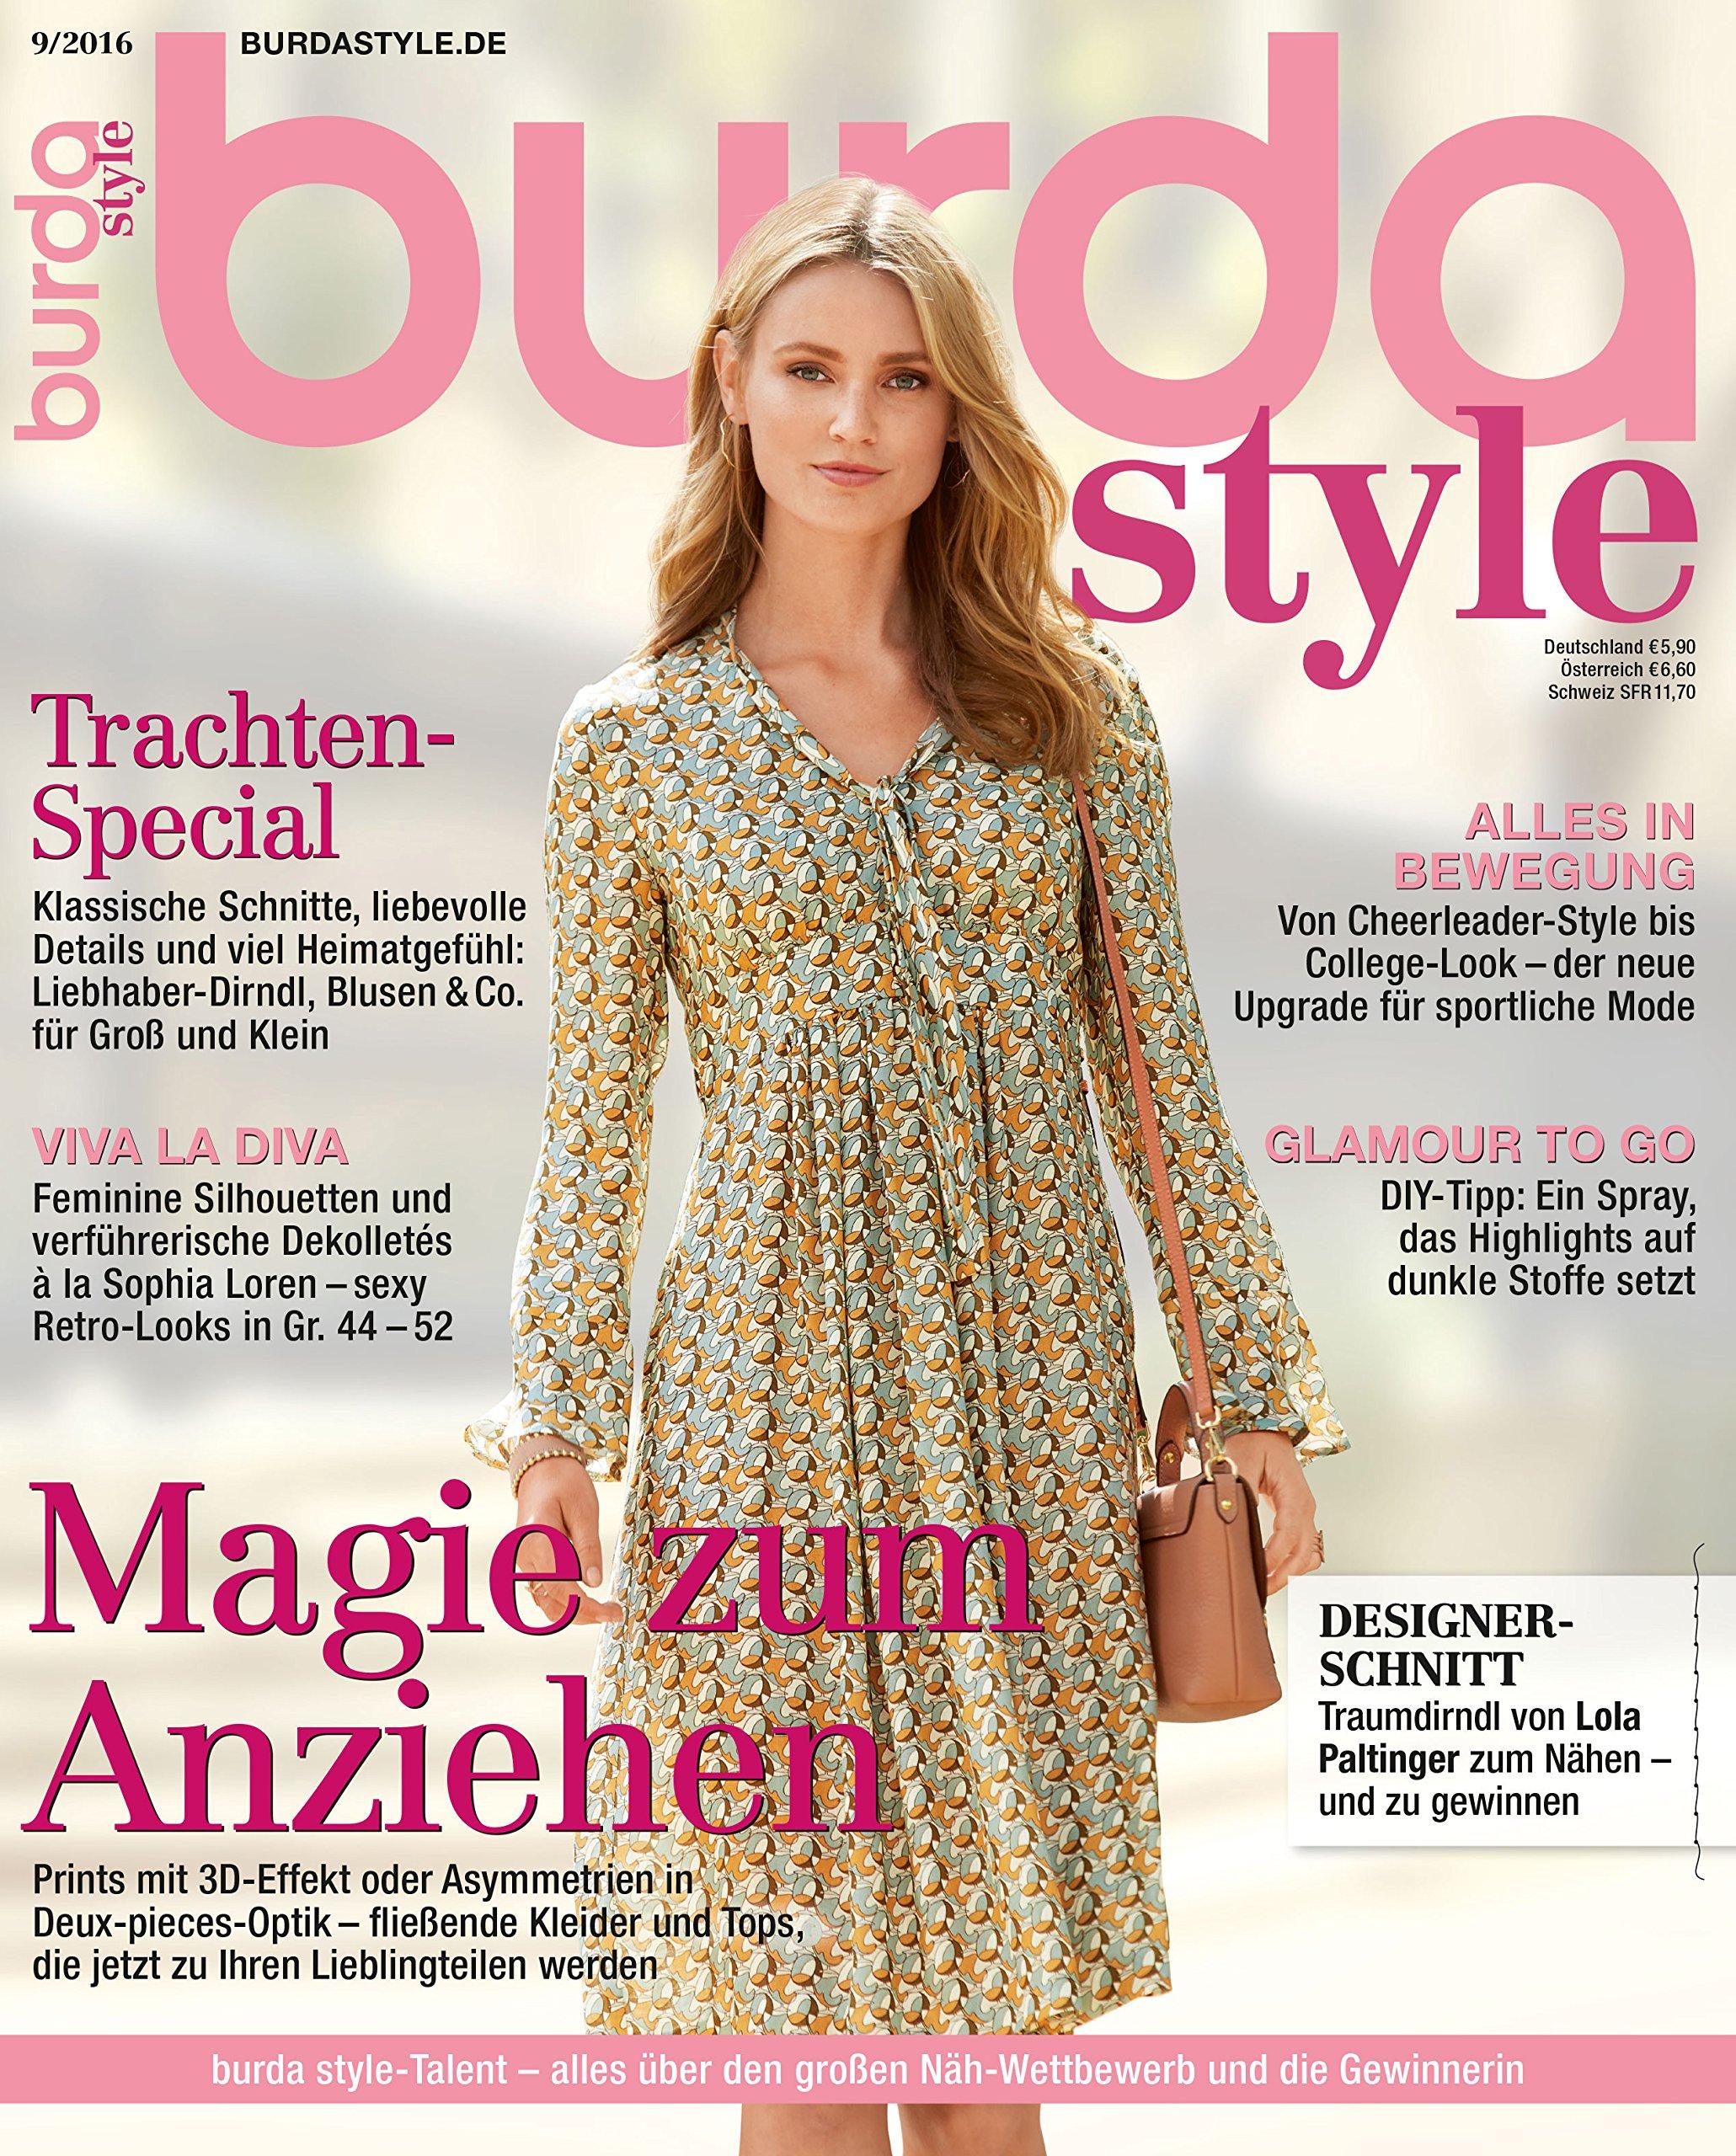 Burda style 2016#09 September-Ausgabe Nähmagazin burda style